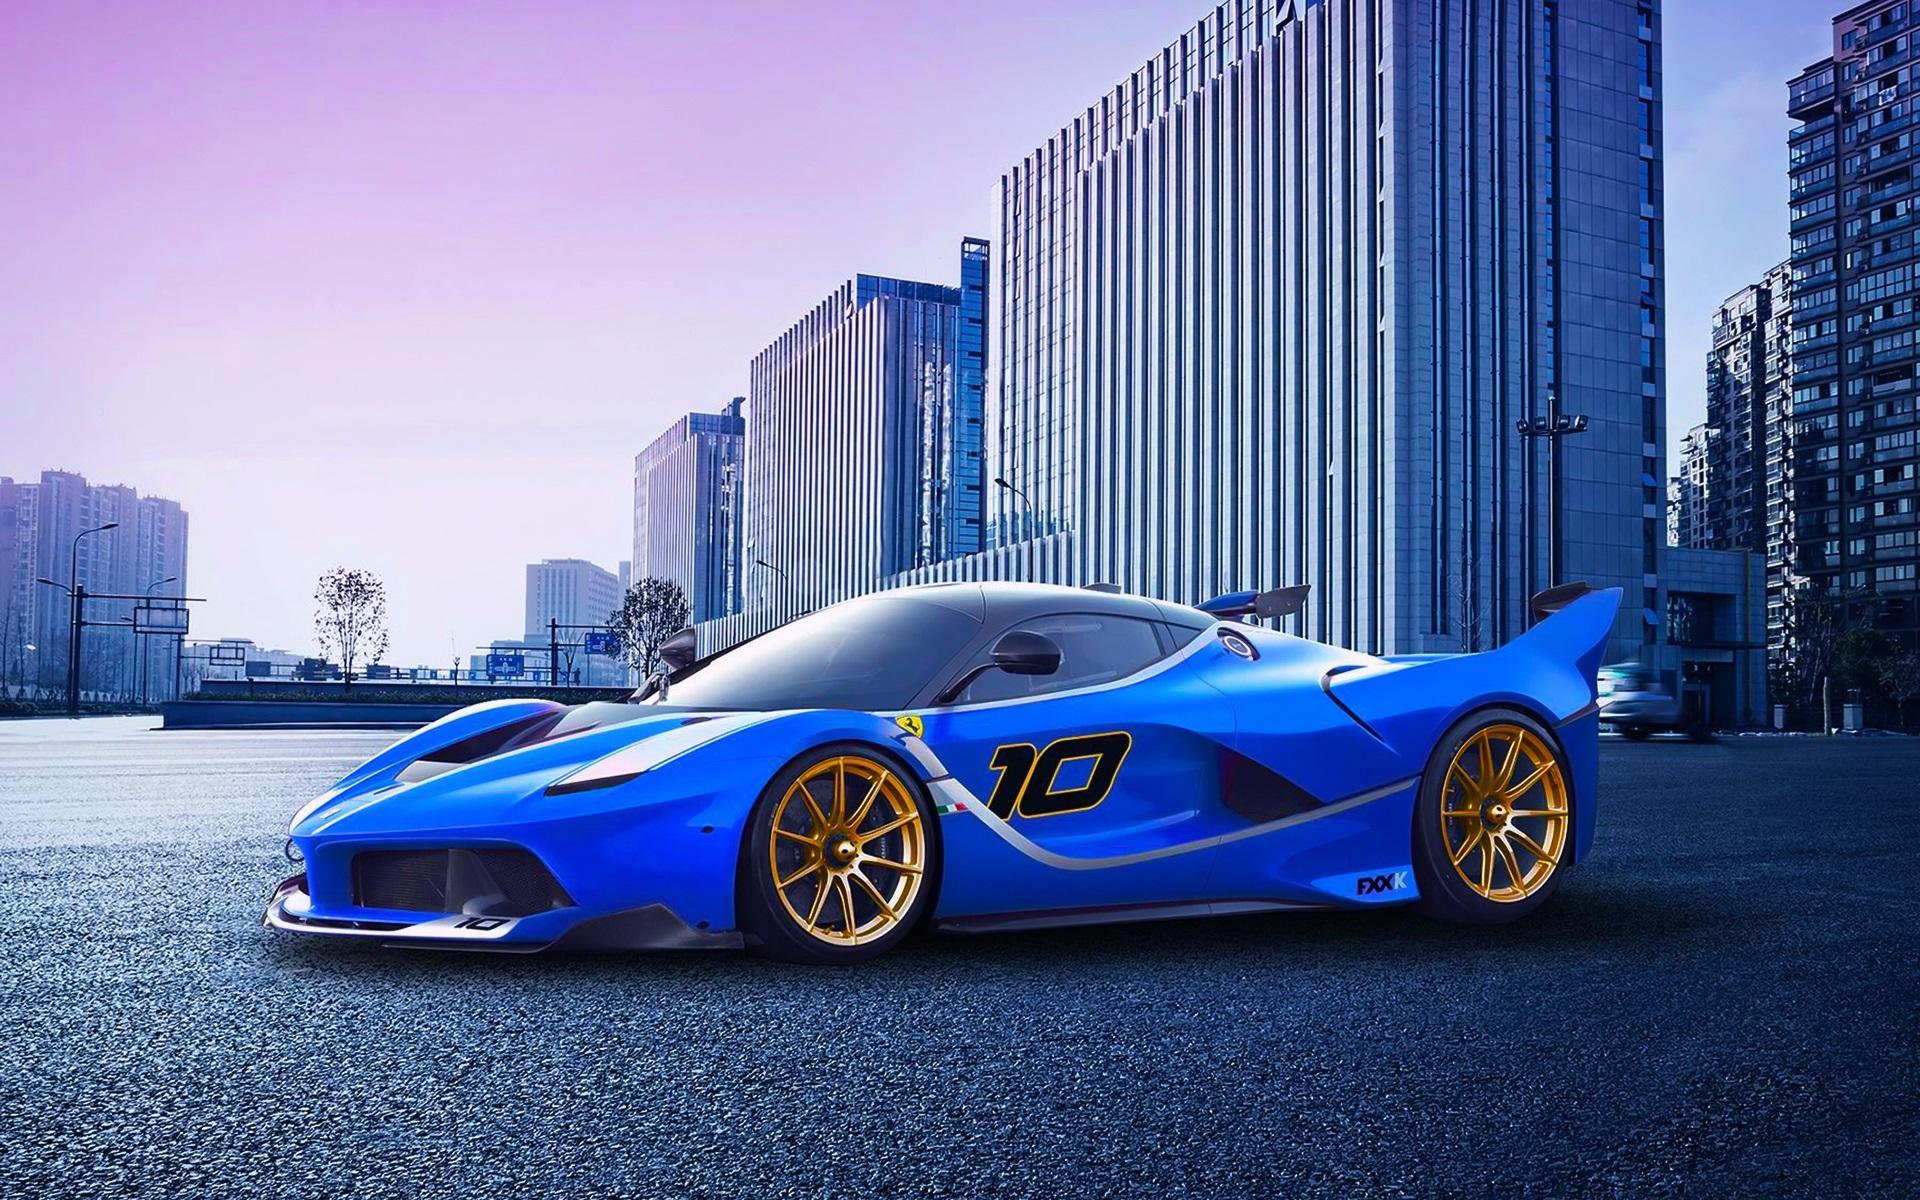 fxx laferrari with Ferrari Fxx K Race Car Blue Supercar 1366x768 on Novitec Rosso Tweaks Ferrari 488 Gtb furthermore Ferrari 458 Gt2 further Japanese Collector Has Pink Ferrari Enzo in addition E6 B3 95 E6 8B 89 E5 88 A9 E6 8B 89 E6 B3 95 E6 89 8B E6 9C BA E5 A3 81 E7 BA B8 as well Gallery Ferrari Usa 60th Anniversary In Beverly Hills.